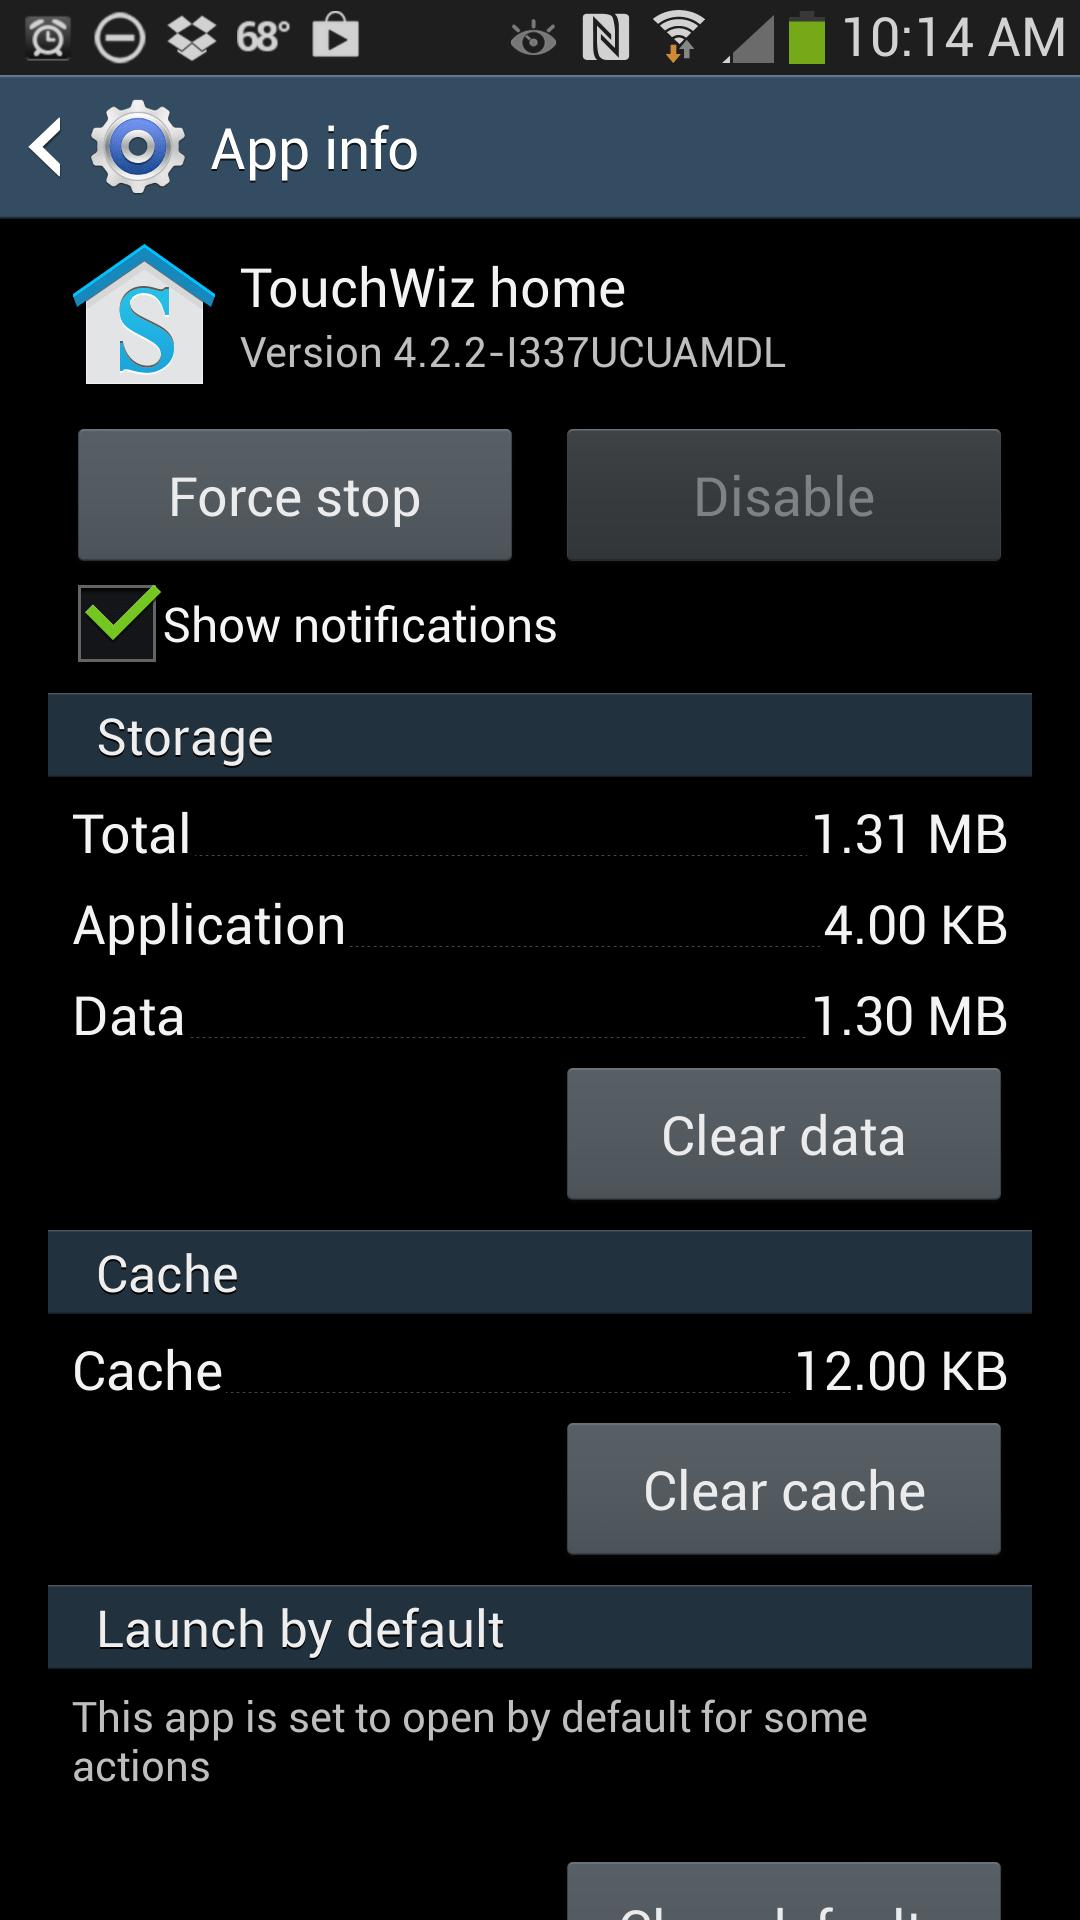 Galaxy s4 clock widget not updating